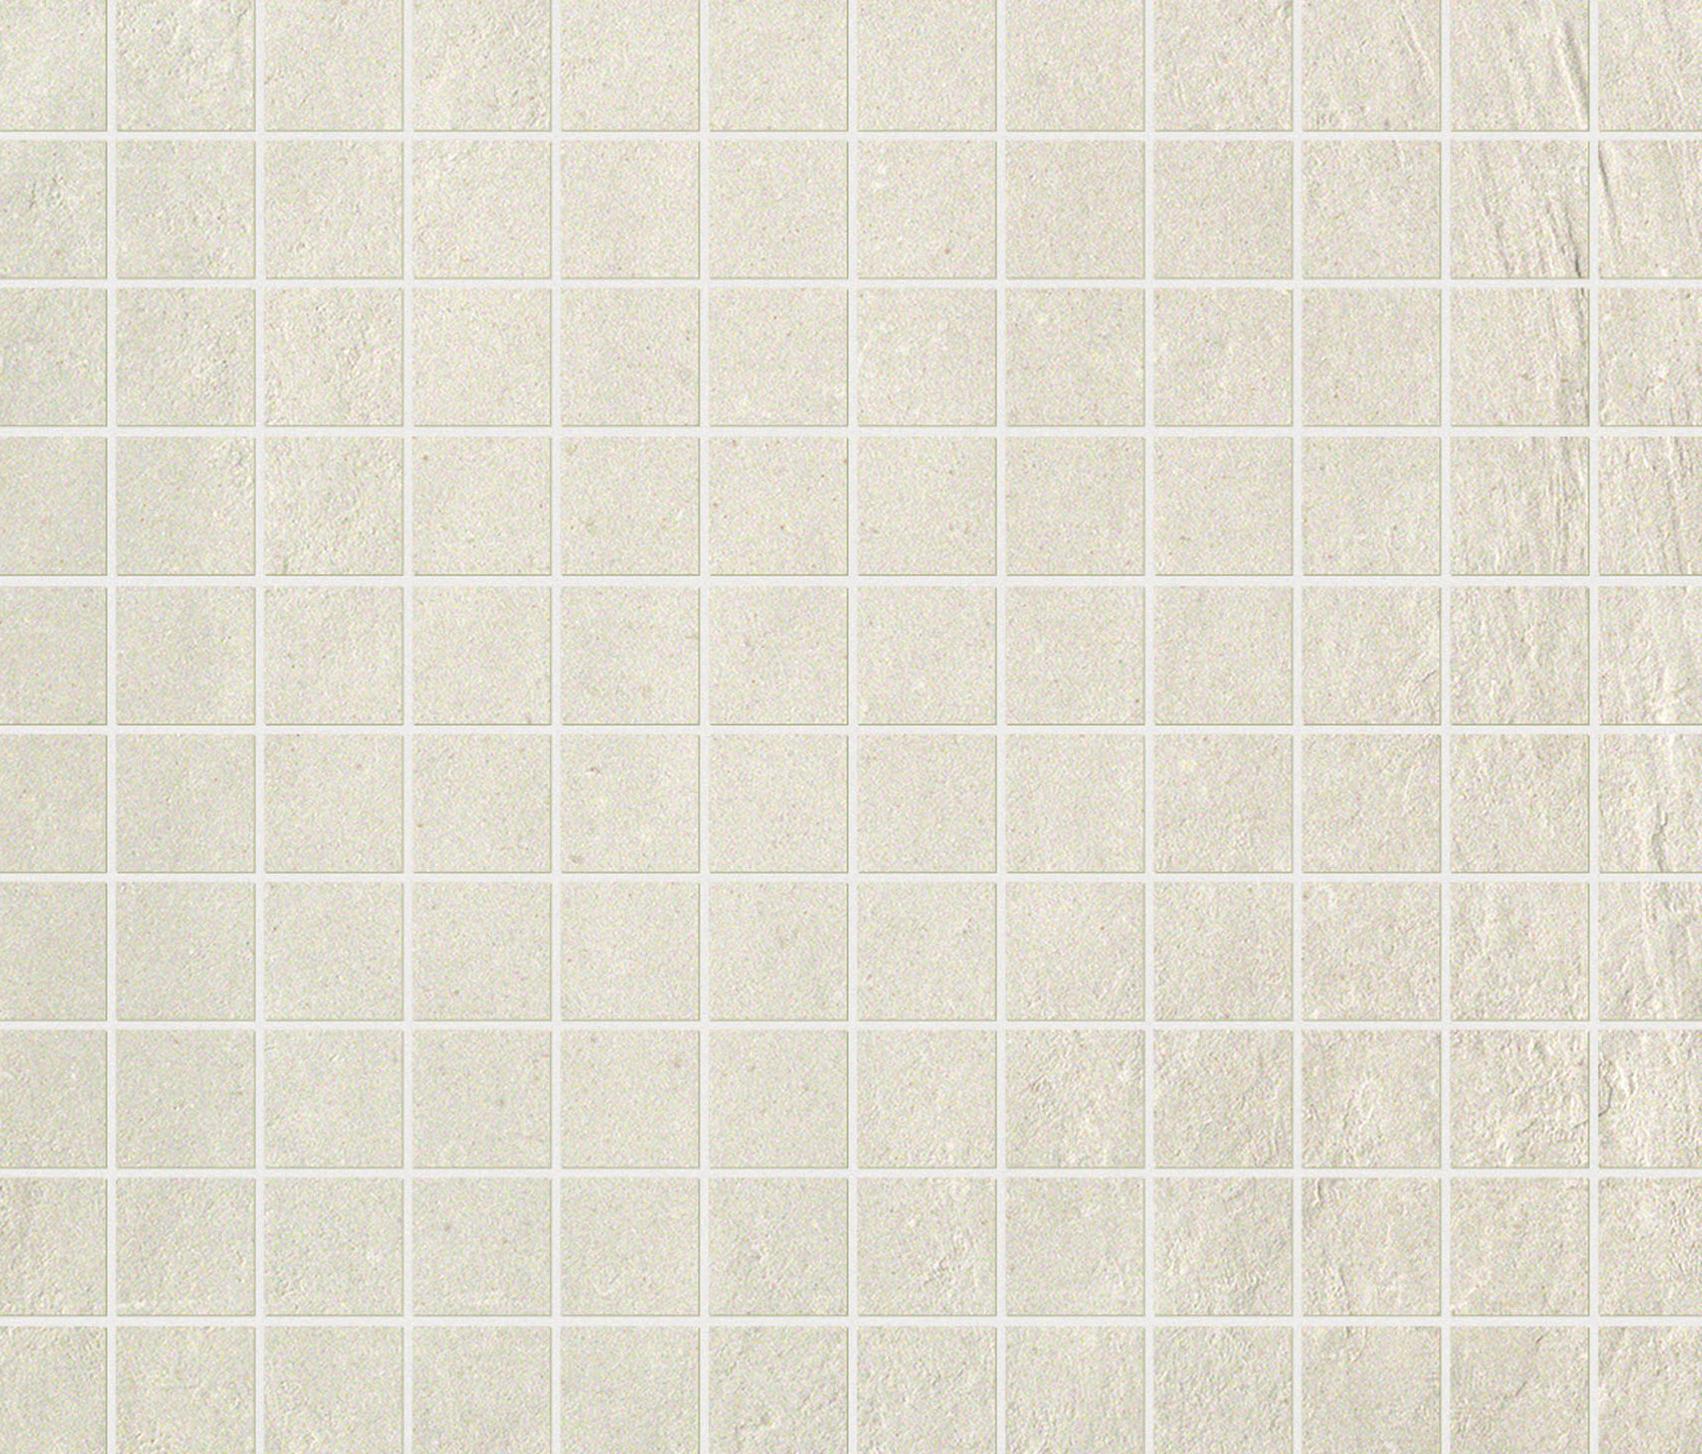 terra avorio mosaico ceramic mosaics from fap ceramiche. Black Bedroom Furniture Sets. Home Design Ideas